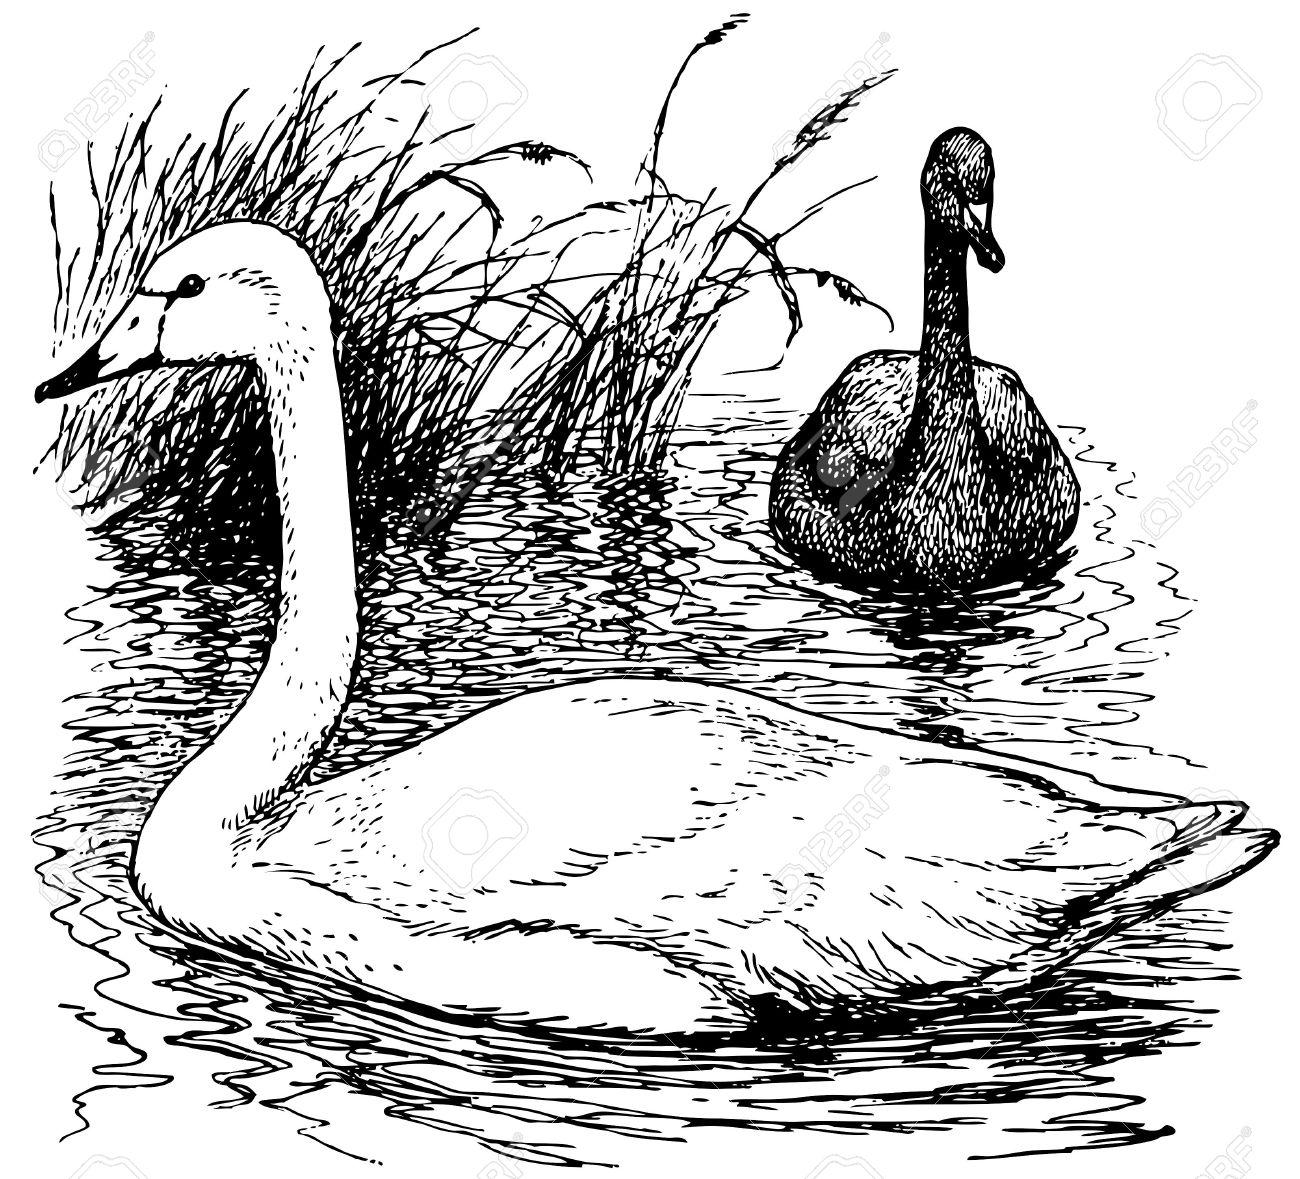 Whooper Swan coloring #2, Download drawings